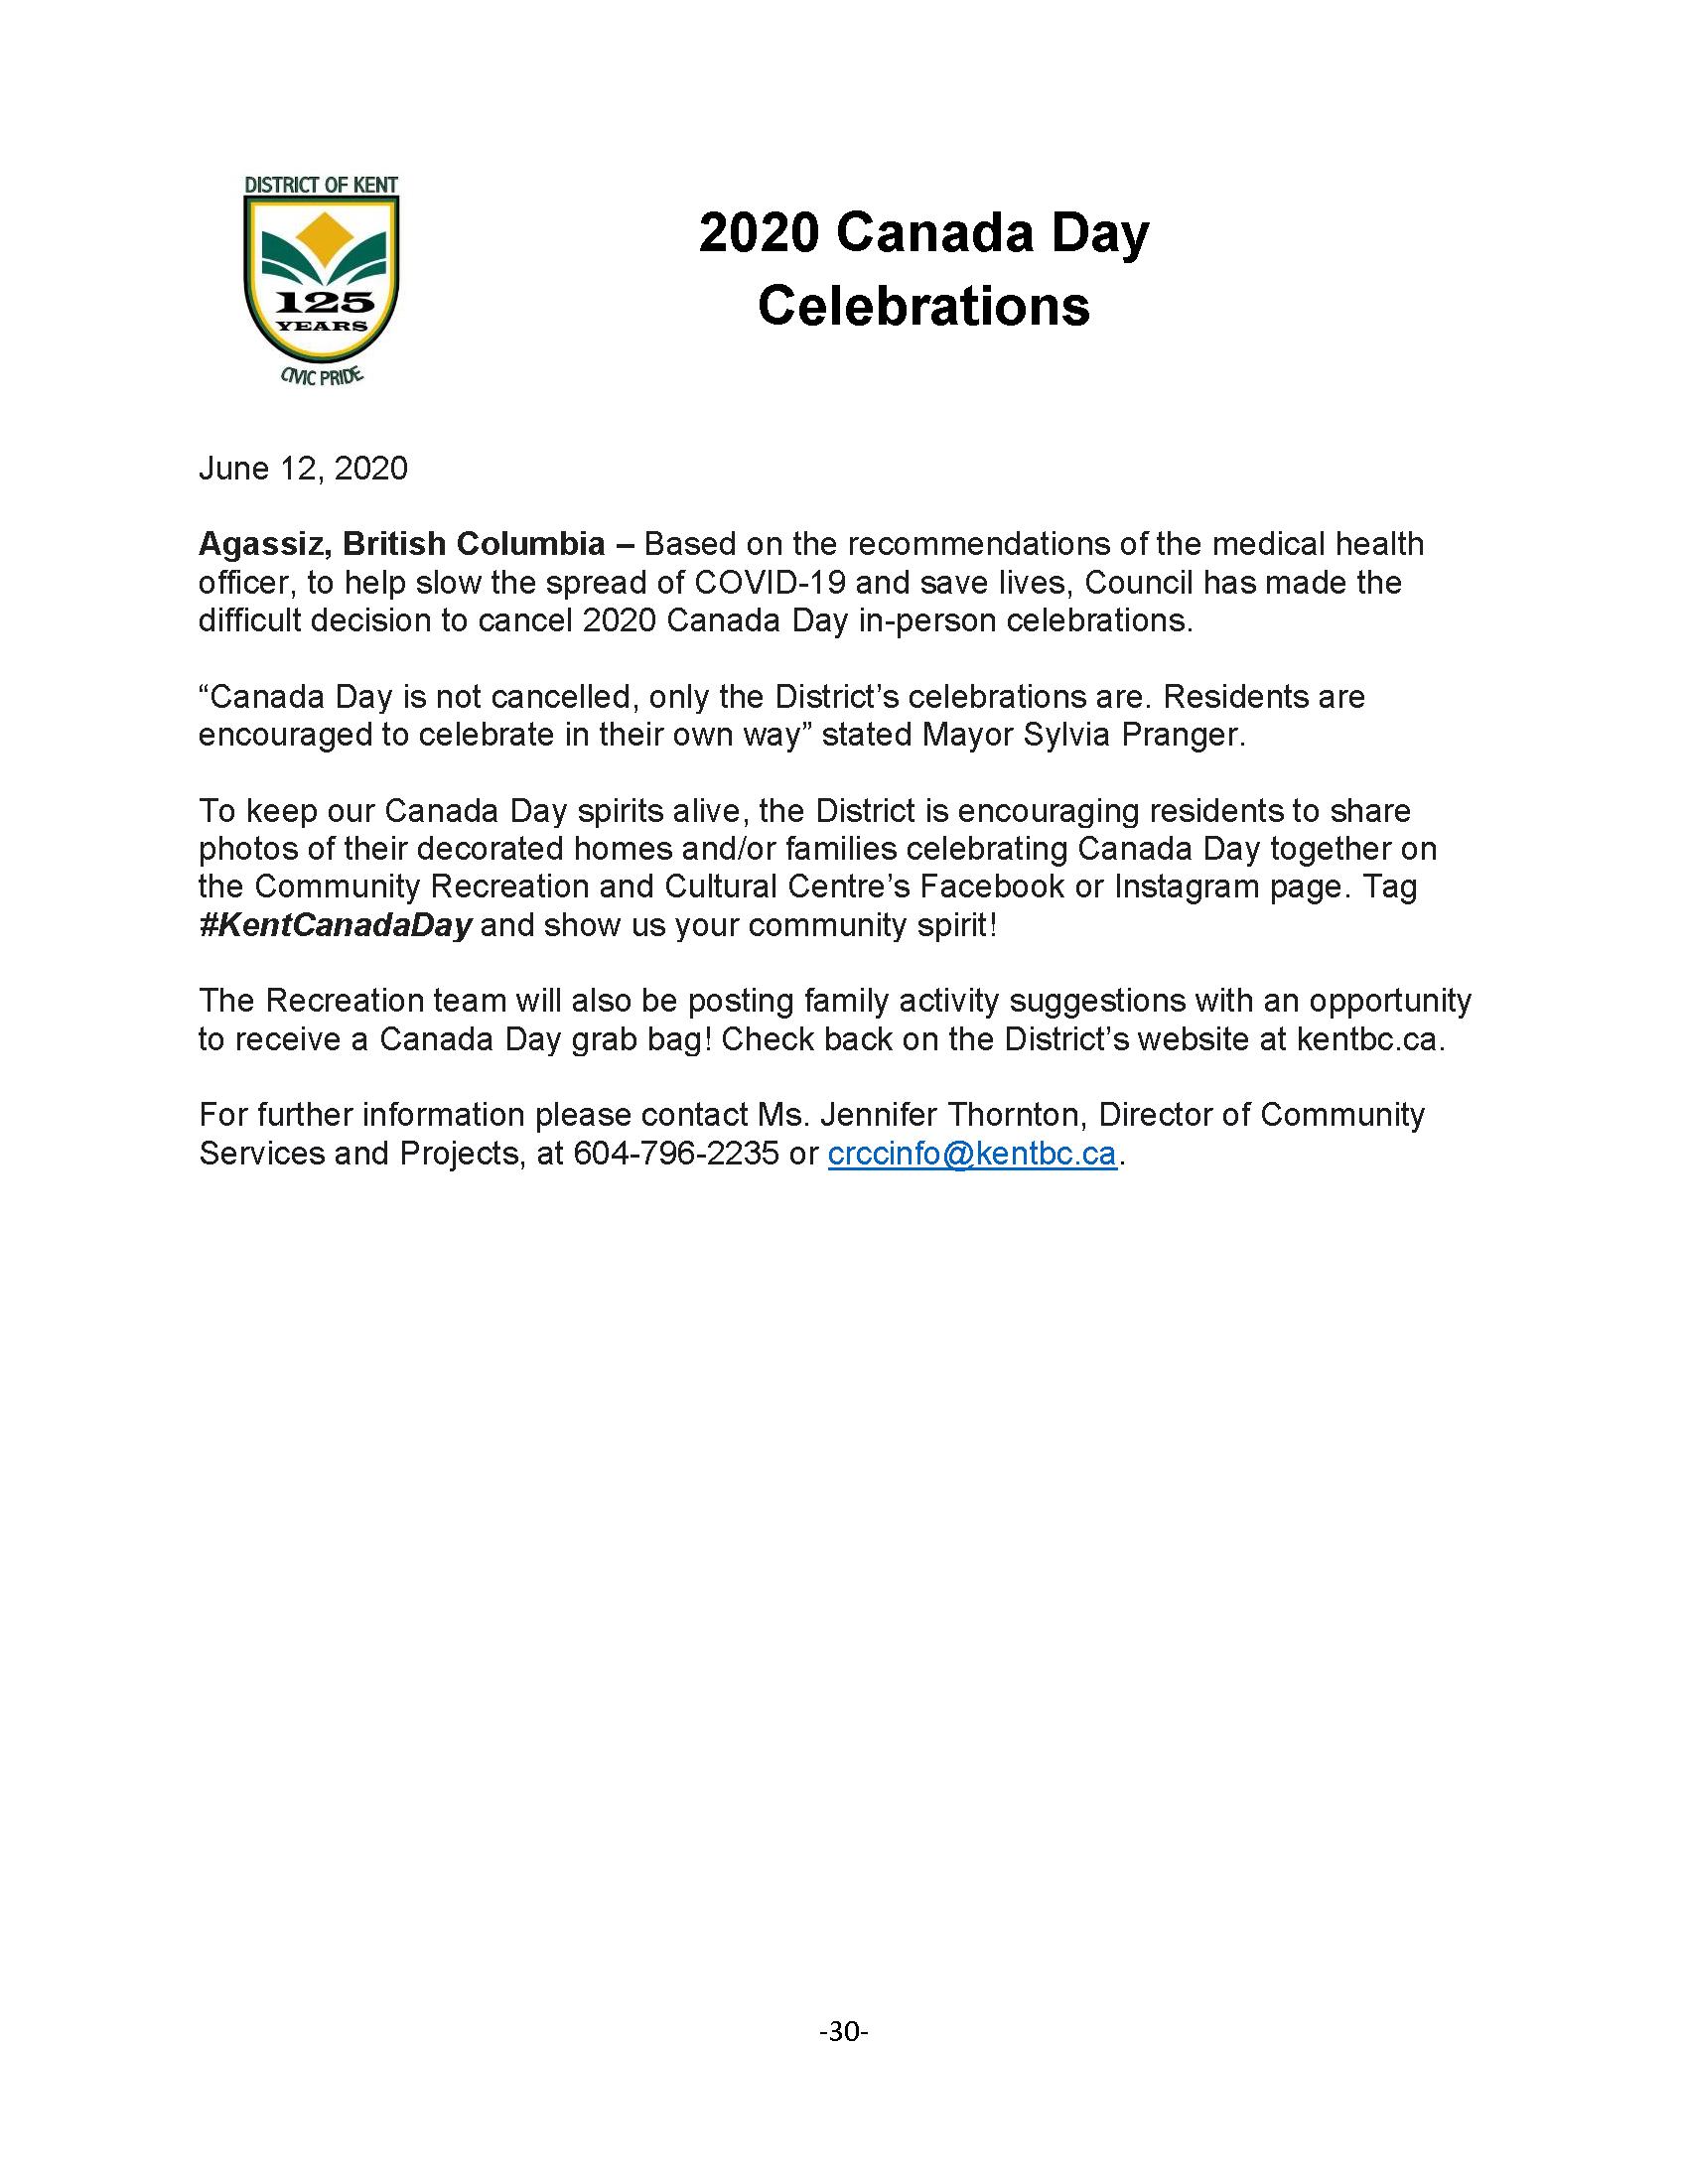 June 12- Canada Day Press Release